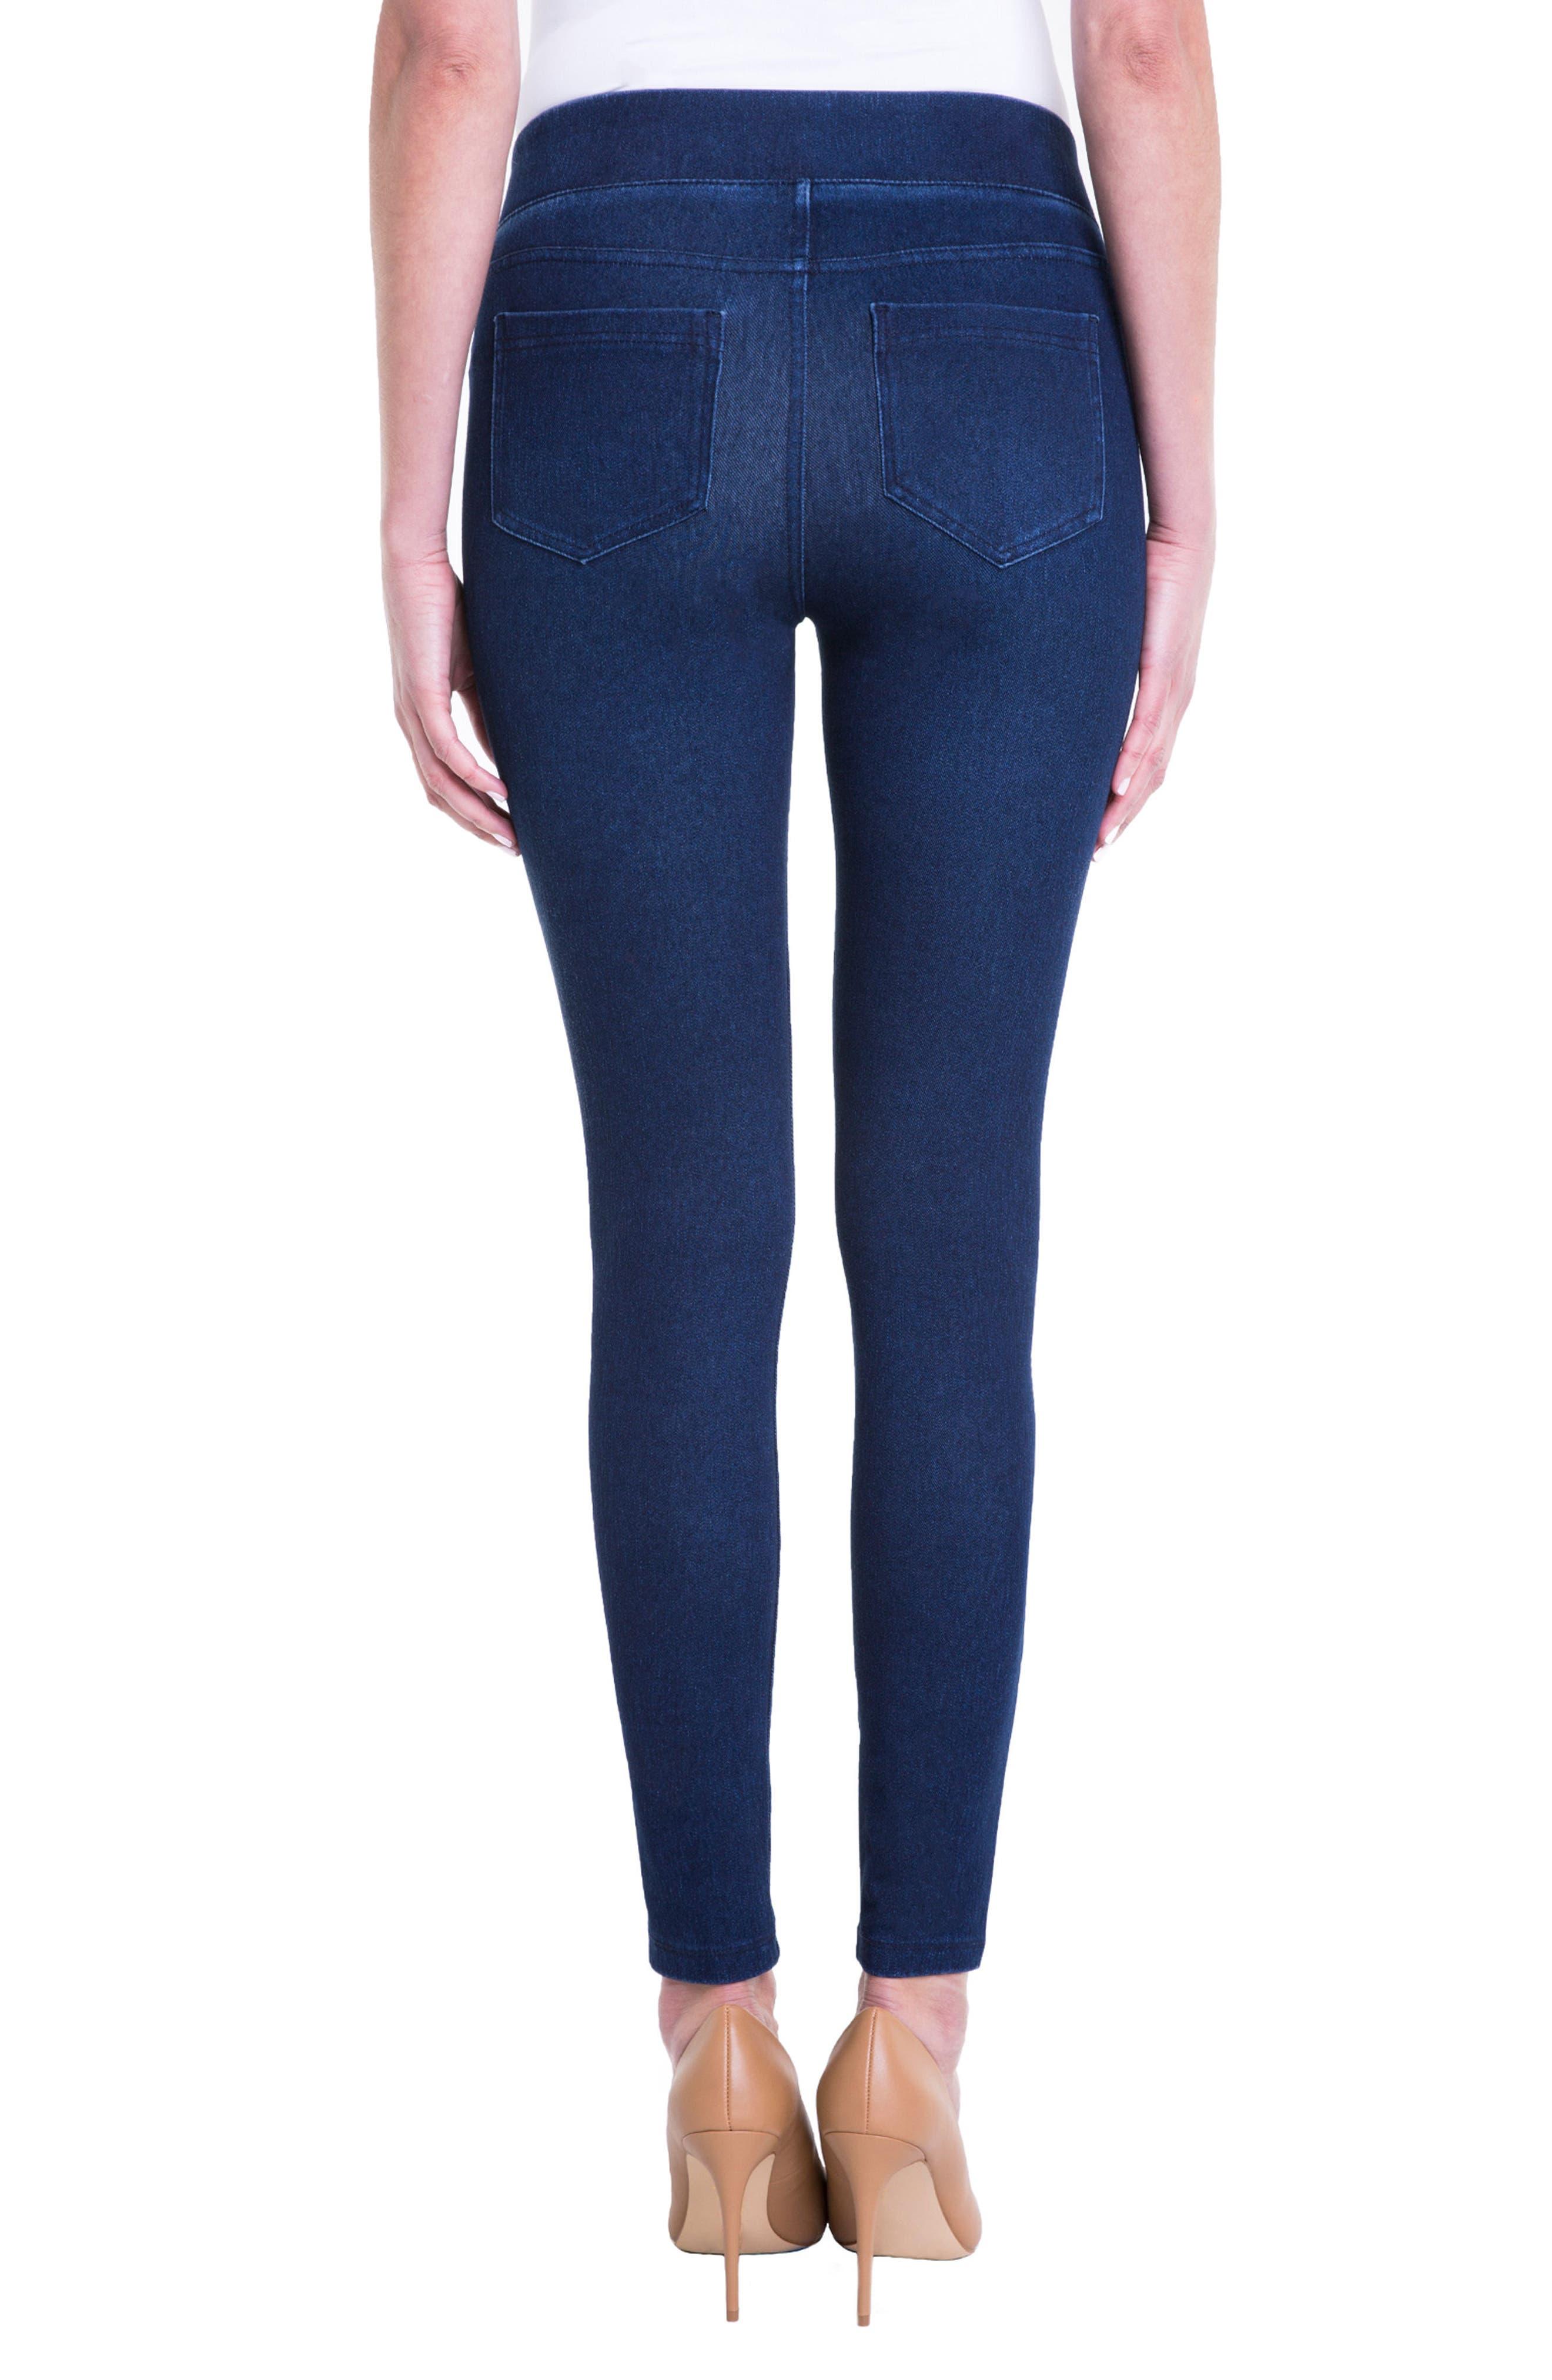 Sienna Pull-On Ankle Legging Jeans,                             Alternate thumbnail 2, color,                             403